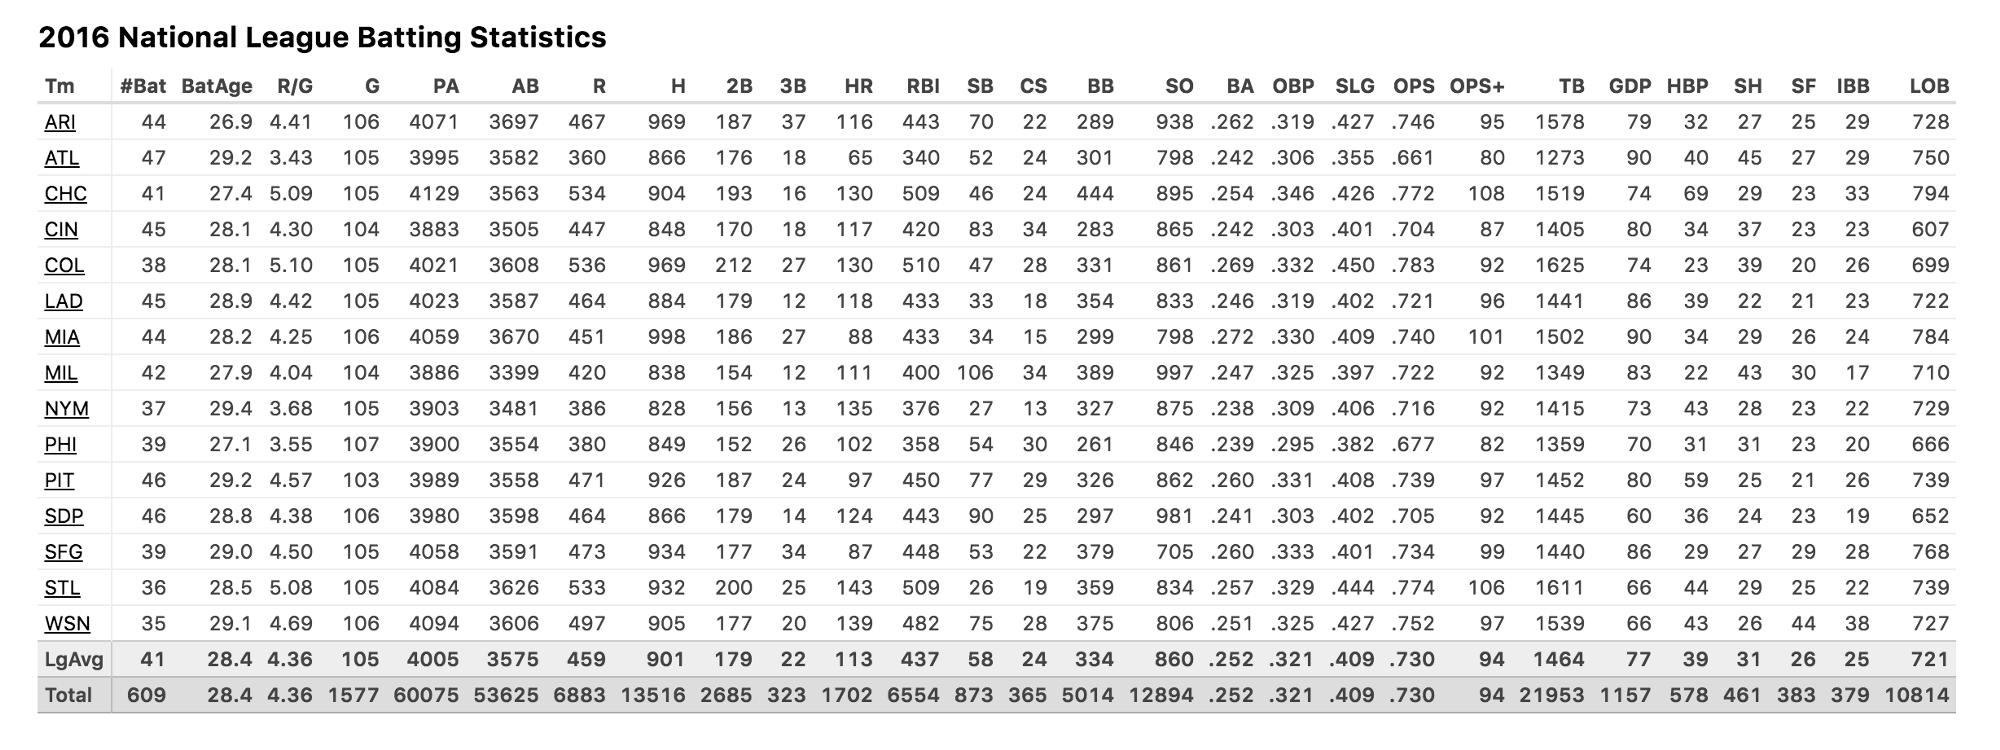 2016 National League Batting Statistics - BaseballReference